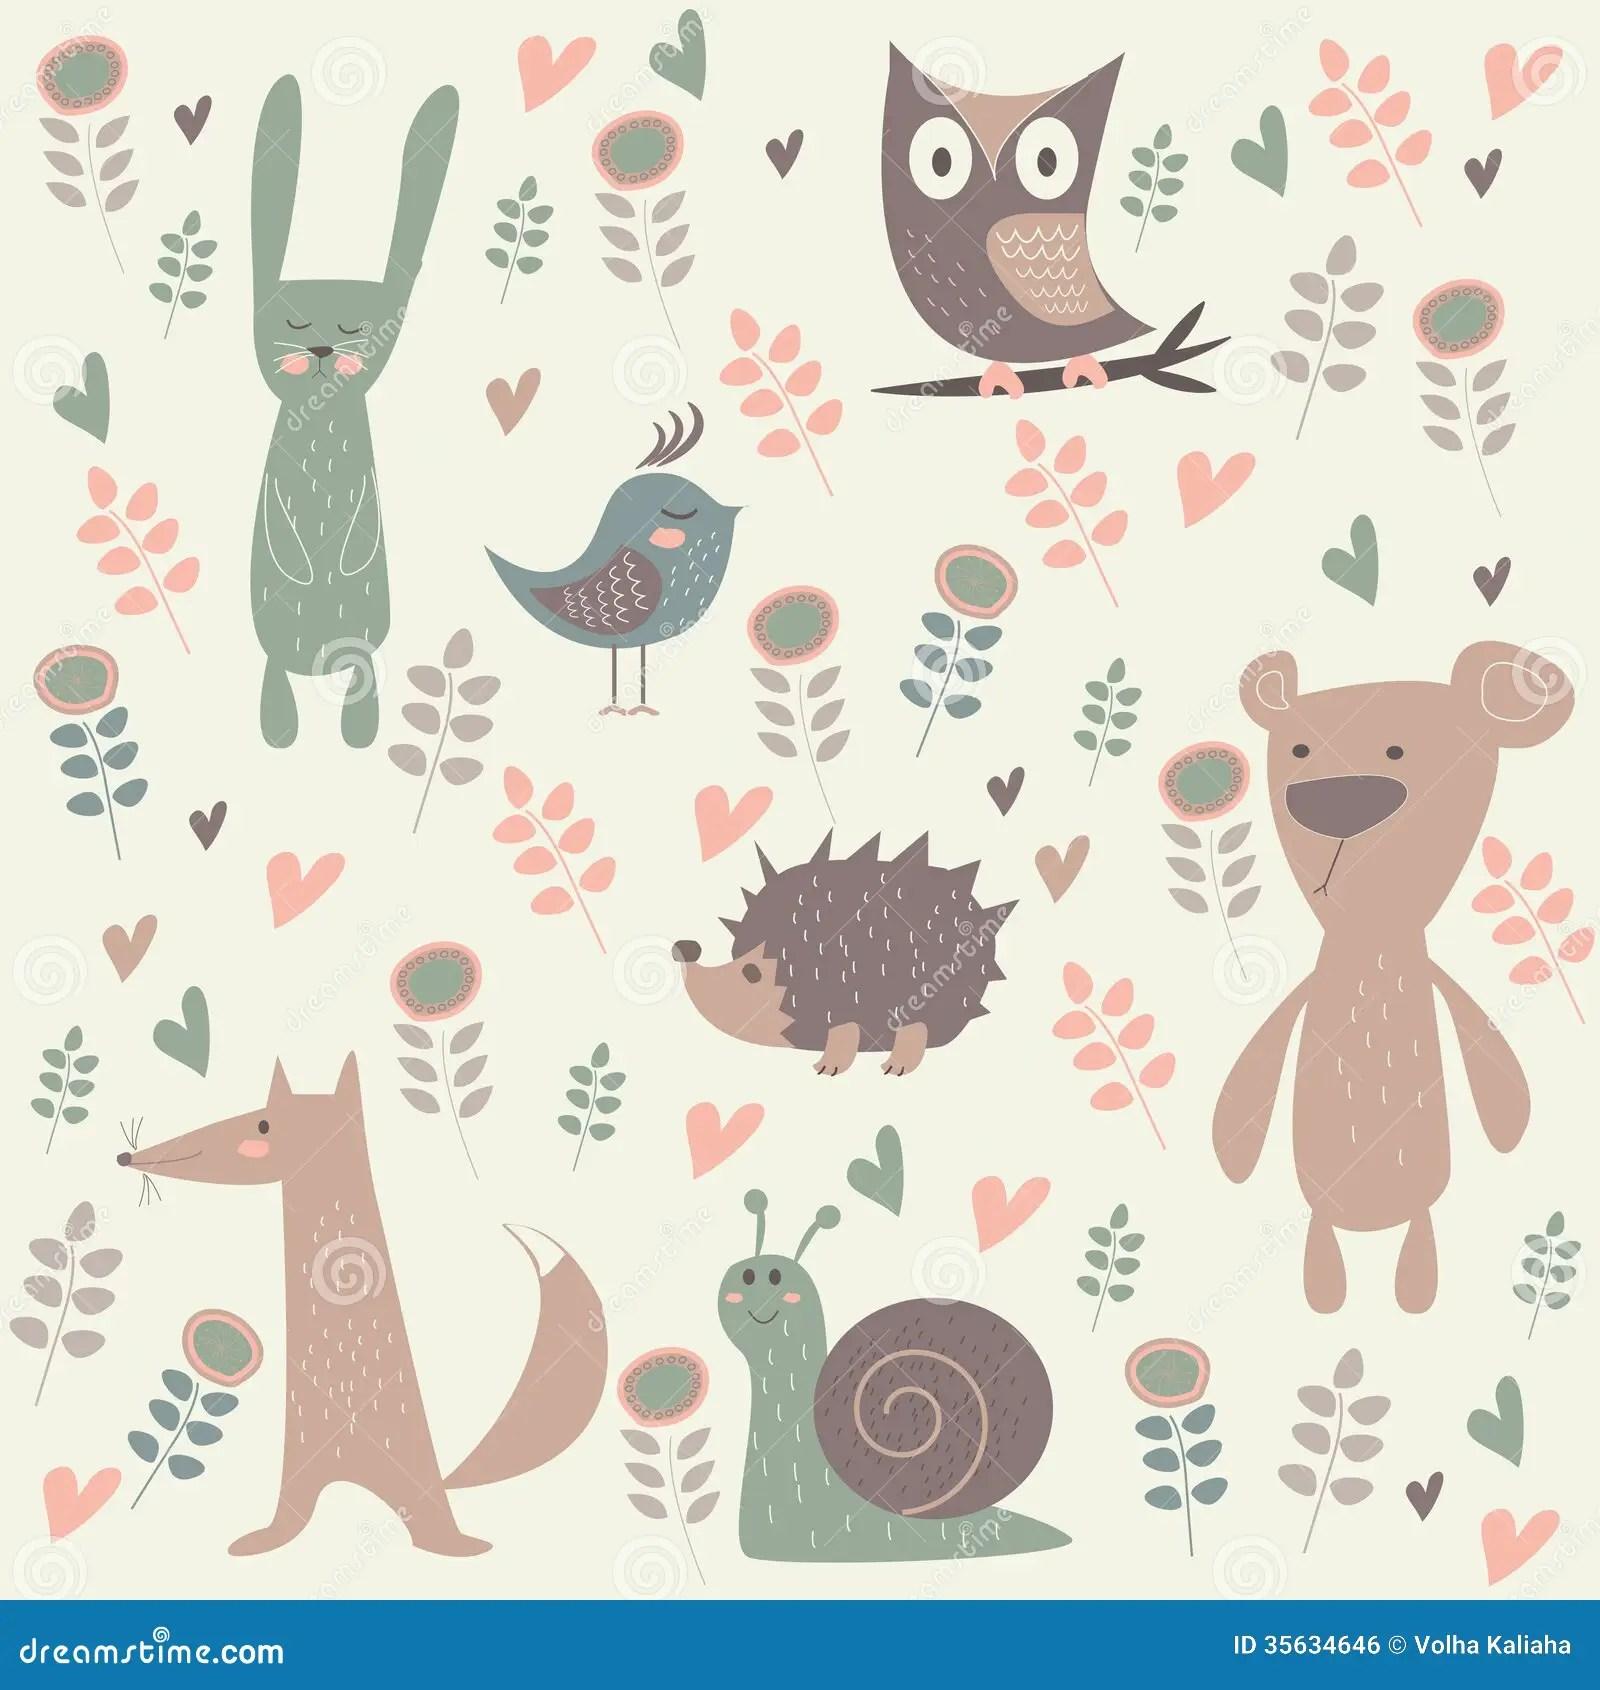 Cute Owl Wallpaper Border Cute Forest Animals Stock Vector Illustration Of Childish